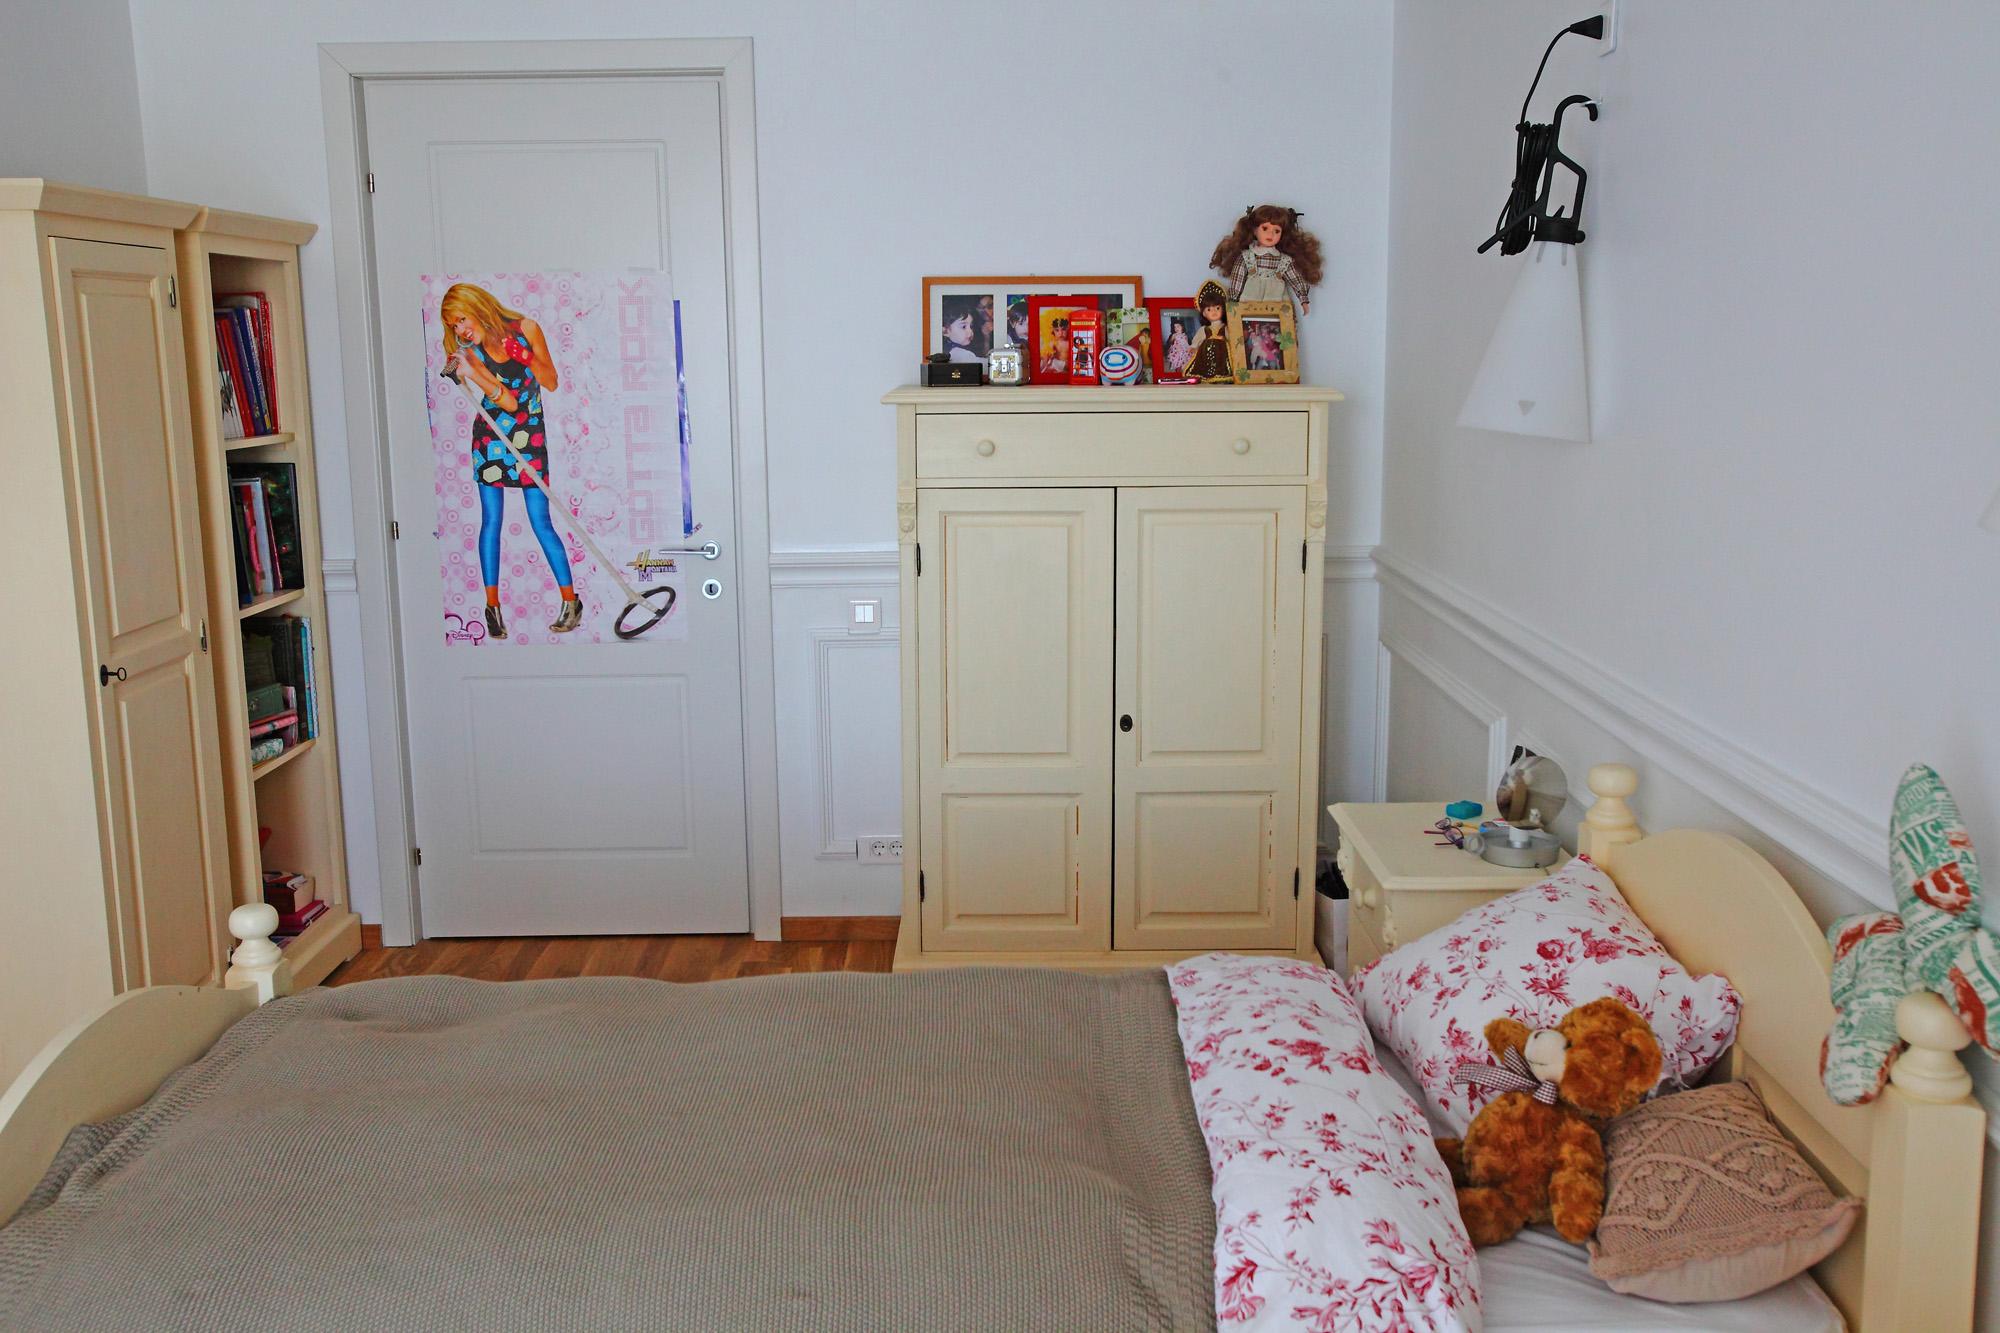 https://ahe-ro.s3.amazonaws.com/12334/apartament-elegant-cu-4-camere-si-terase-generoase-in-centrul-bucurestiului-%2812%29.jpg